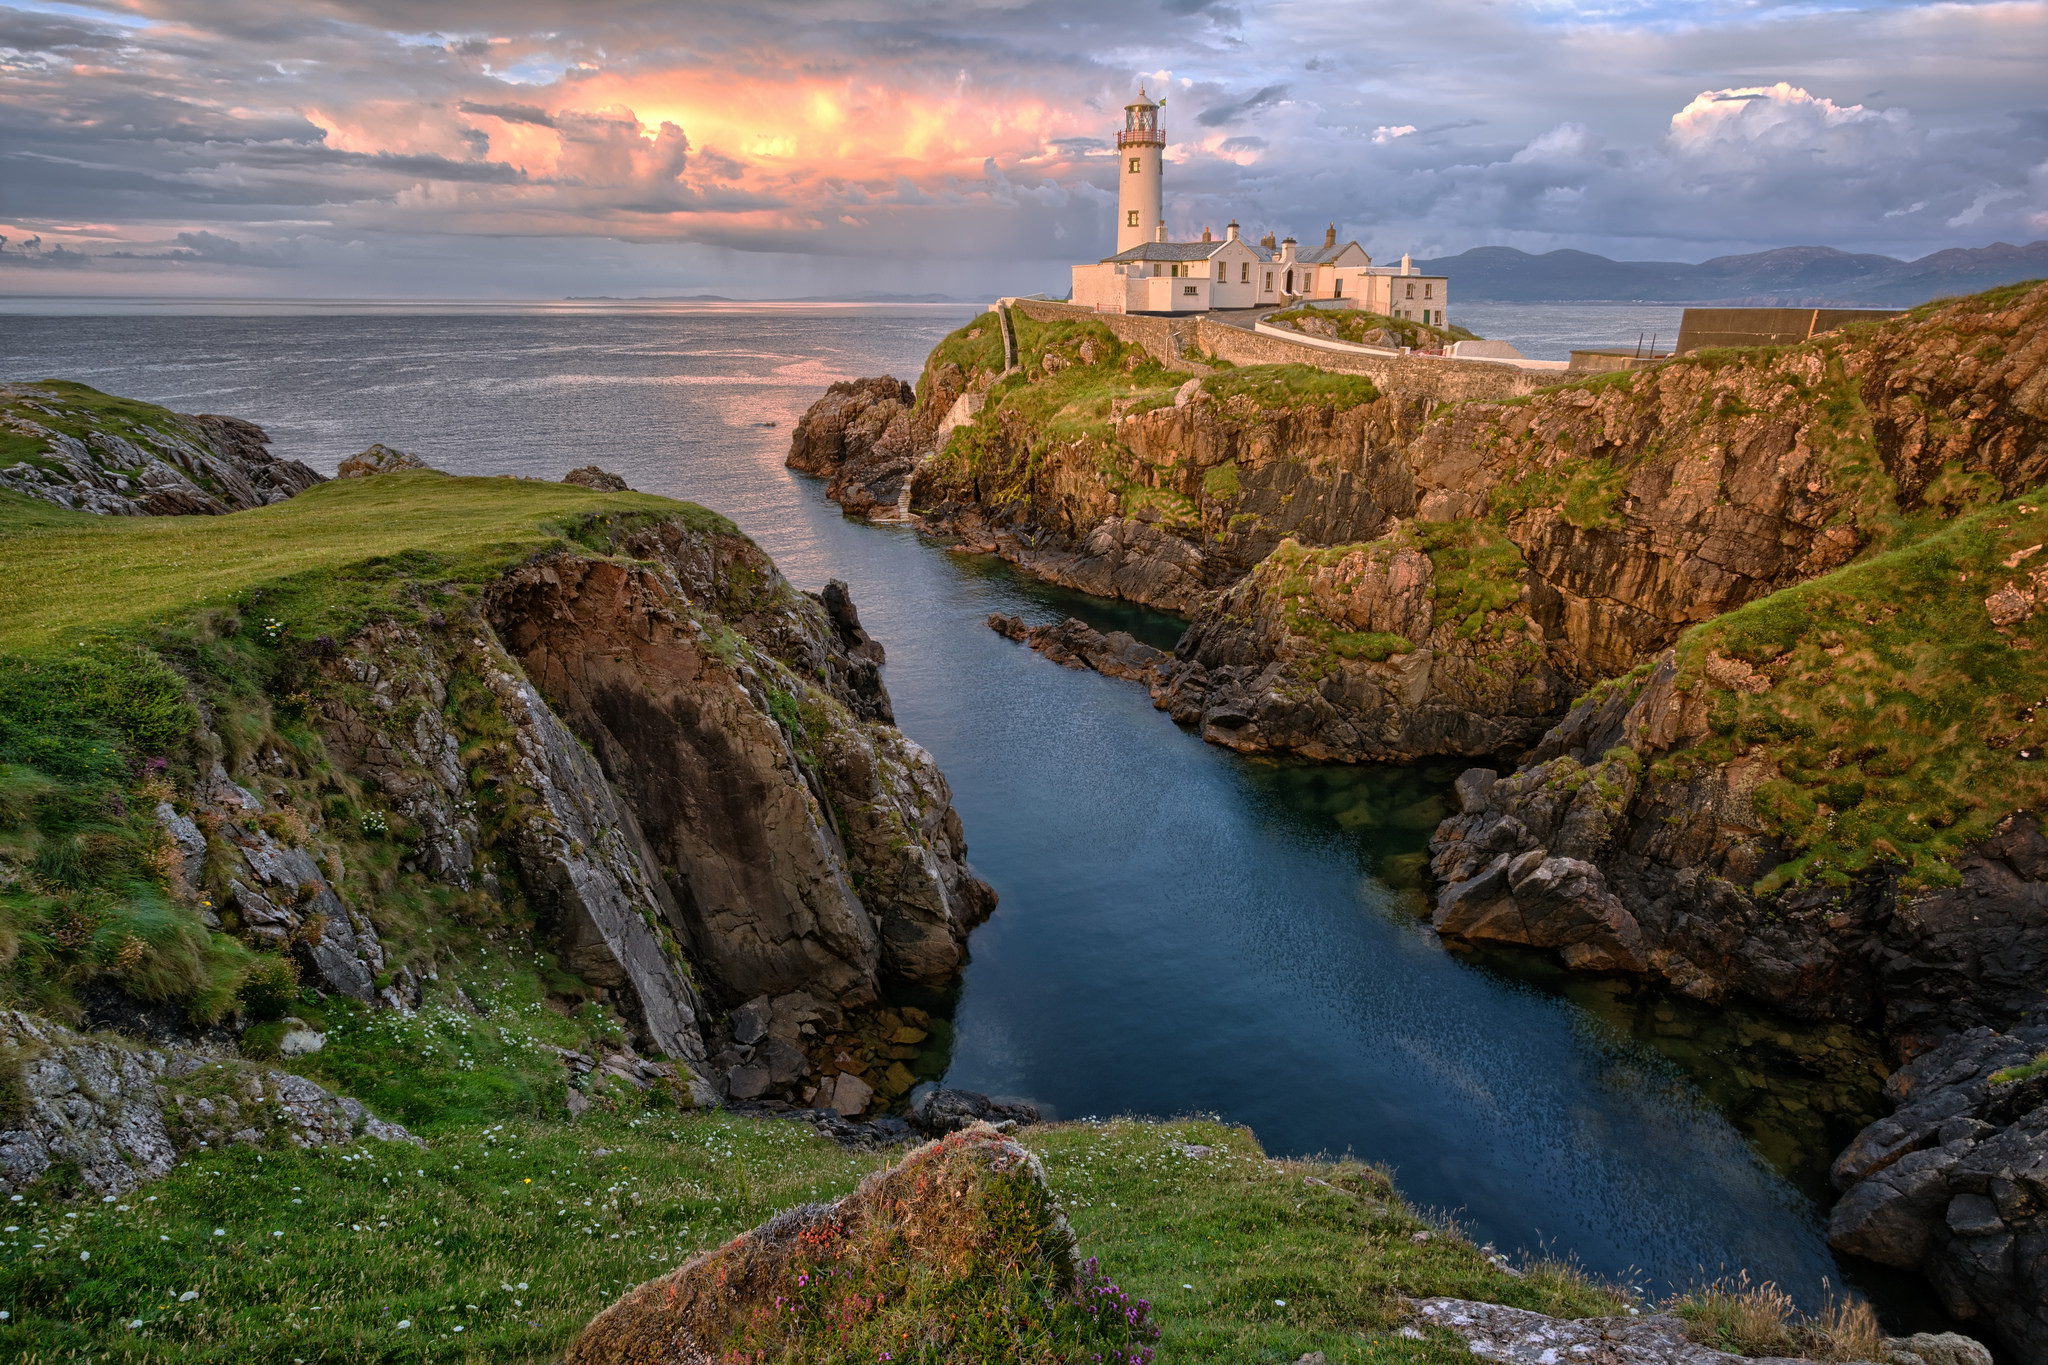 обои Fanad Peninsula, County Donegal, Ireland, Fanad Head Lighthouse картинки фото